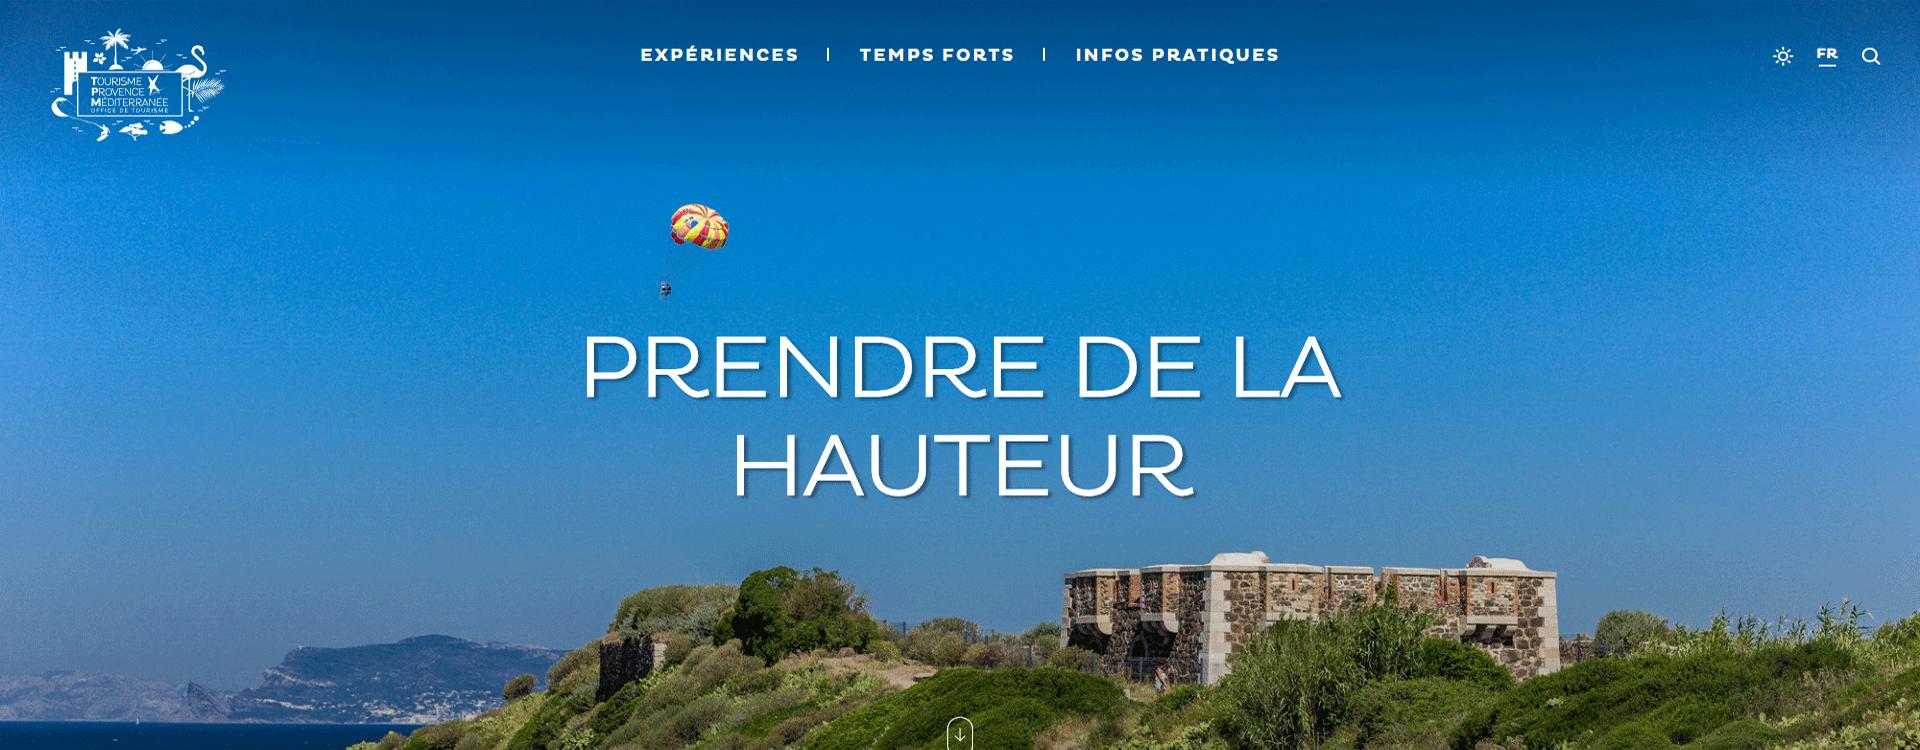 tourismeprovencemediterranee.com